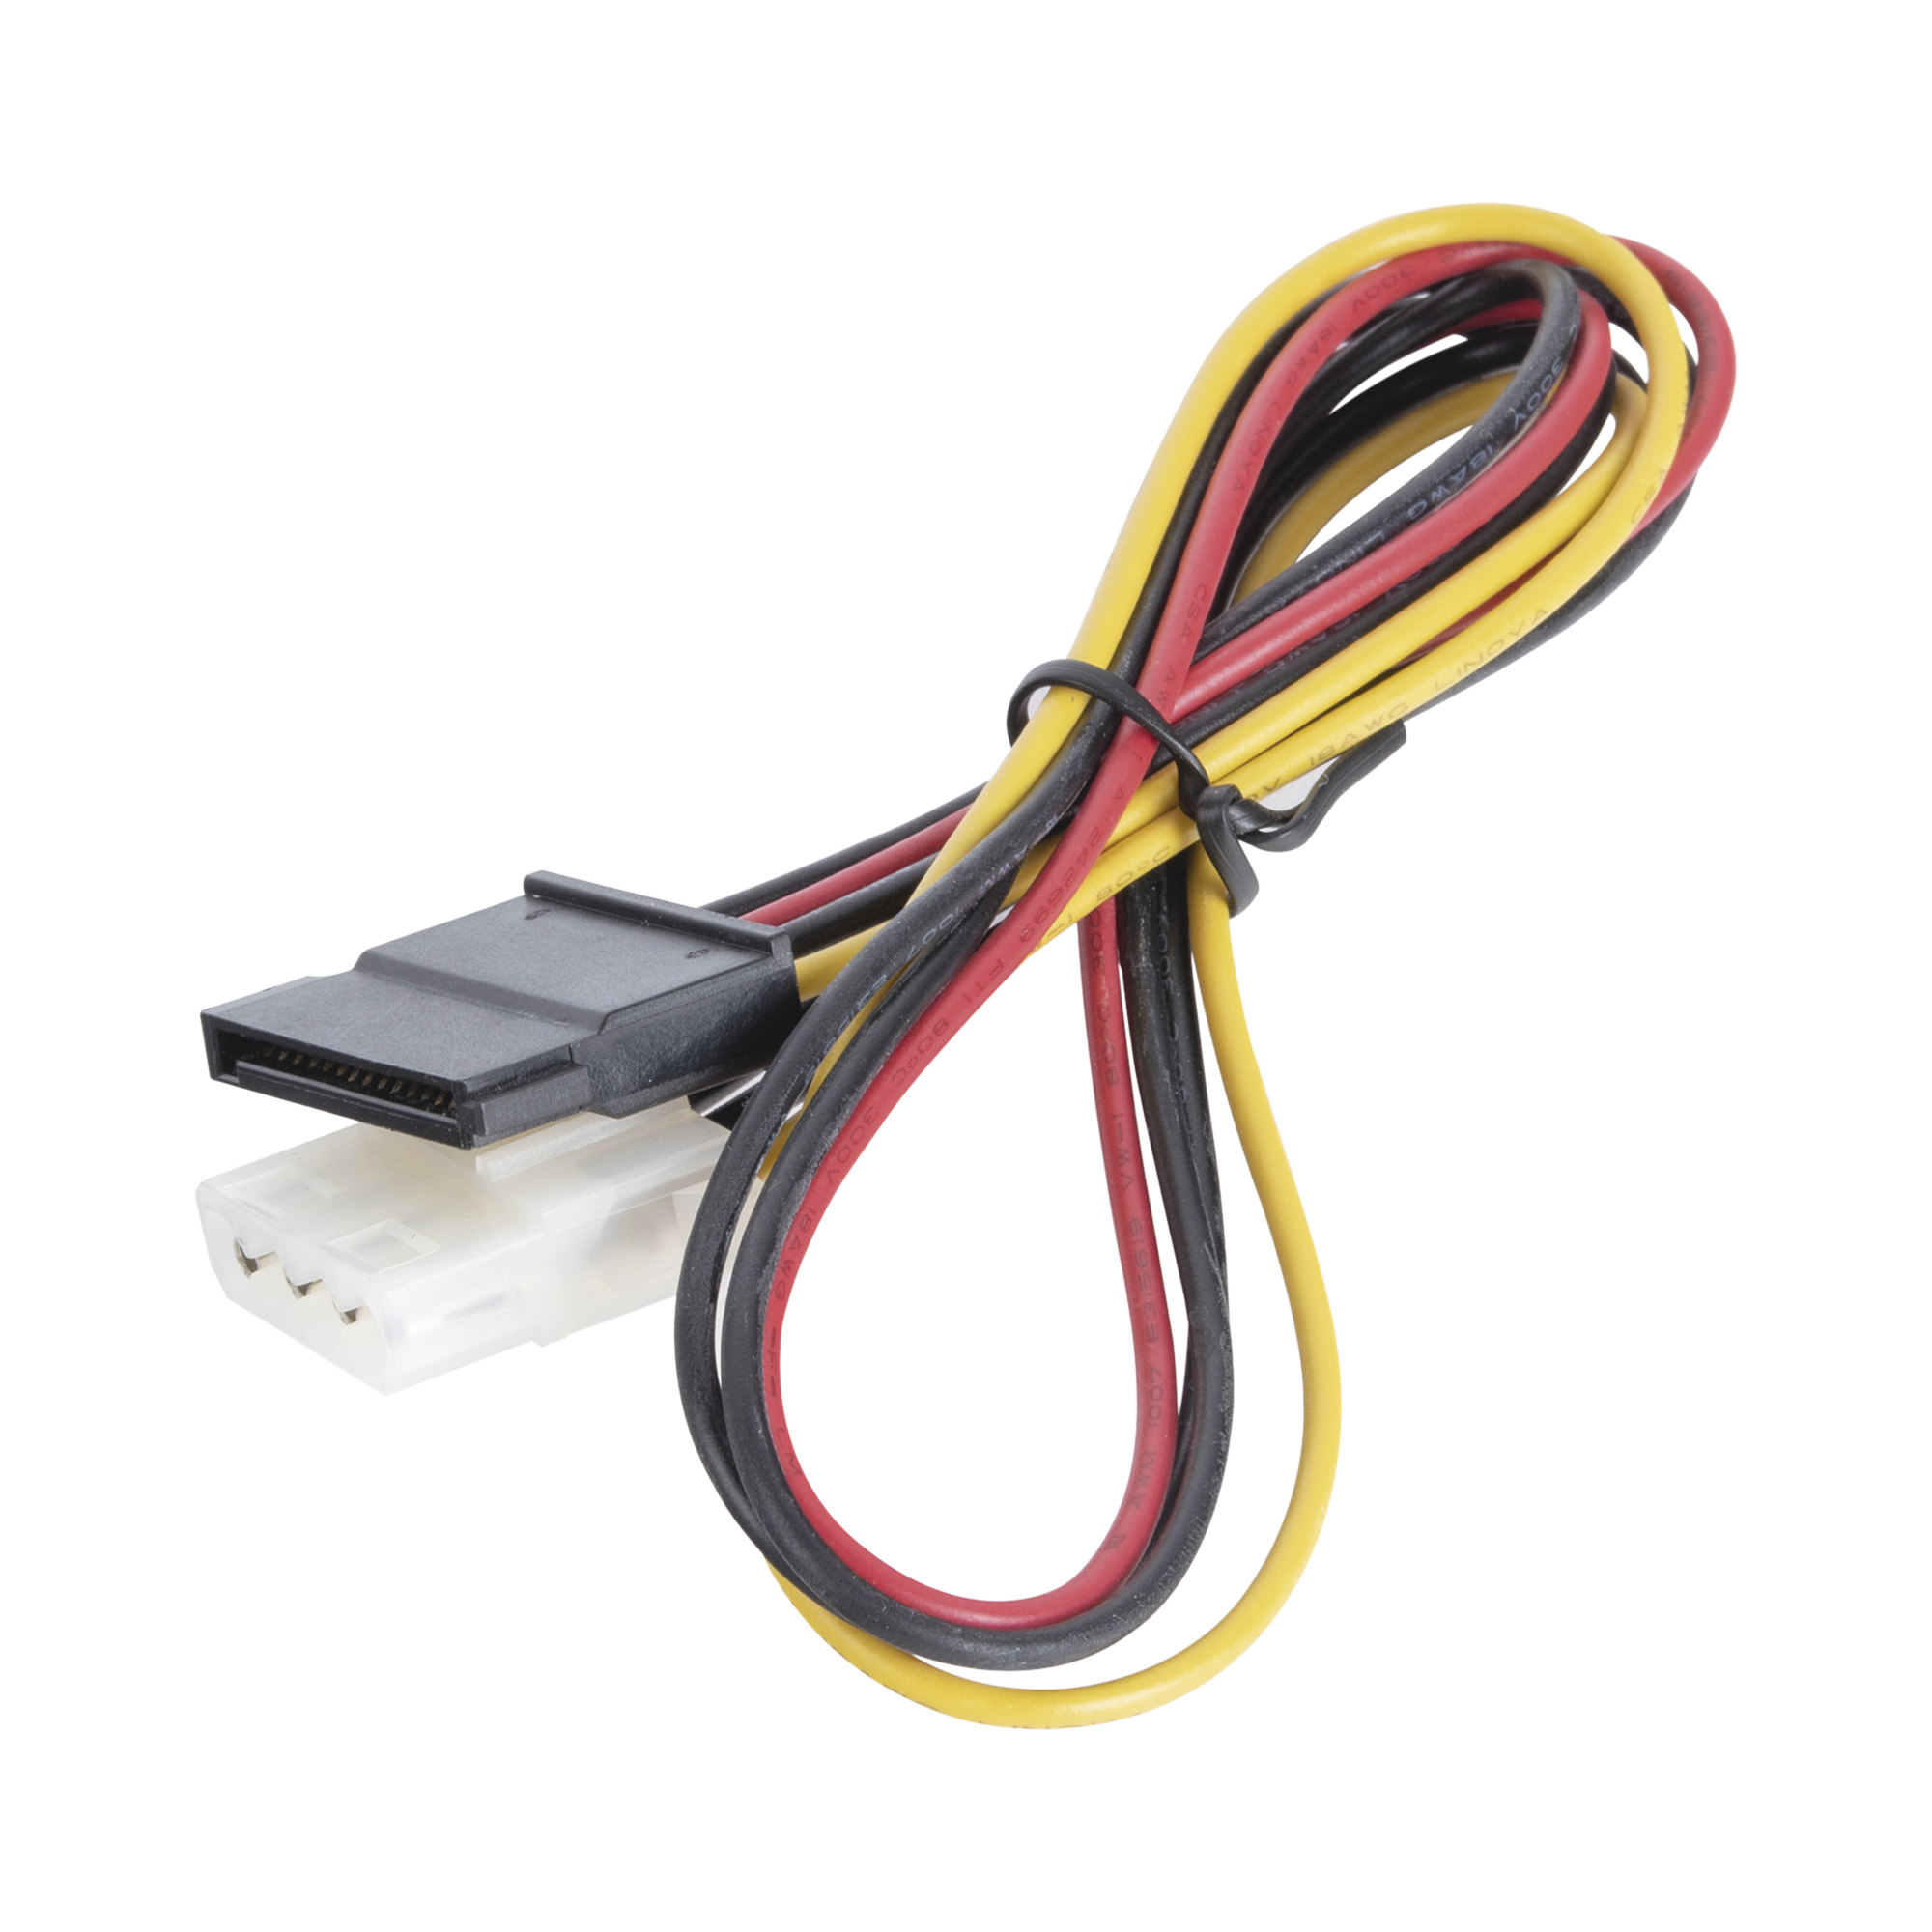 Cable de Corriente Simple Sata HI 4Sata  /F,0.4m para DVR HIKVISION